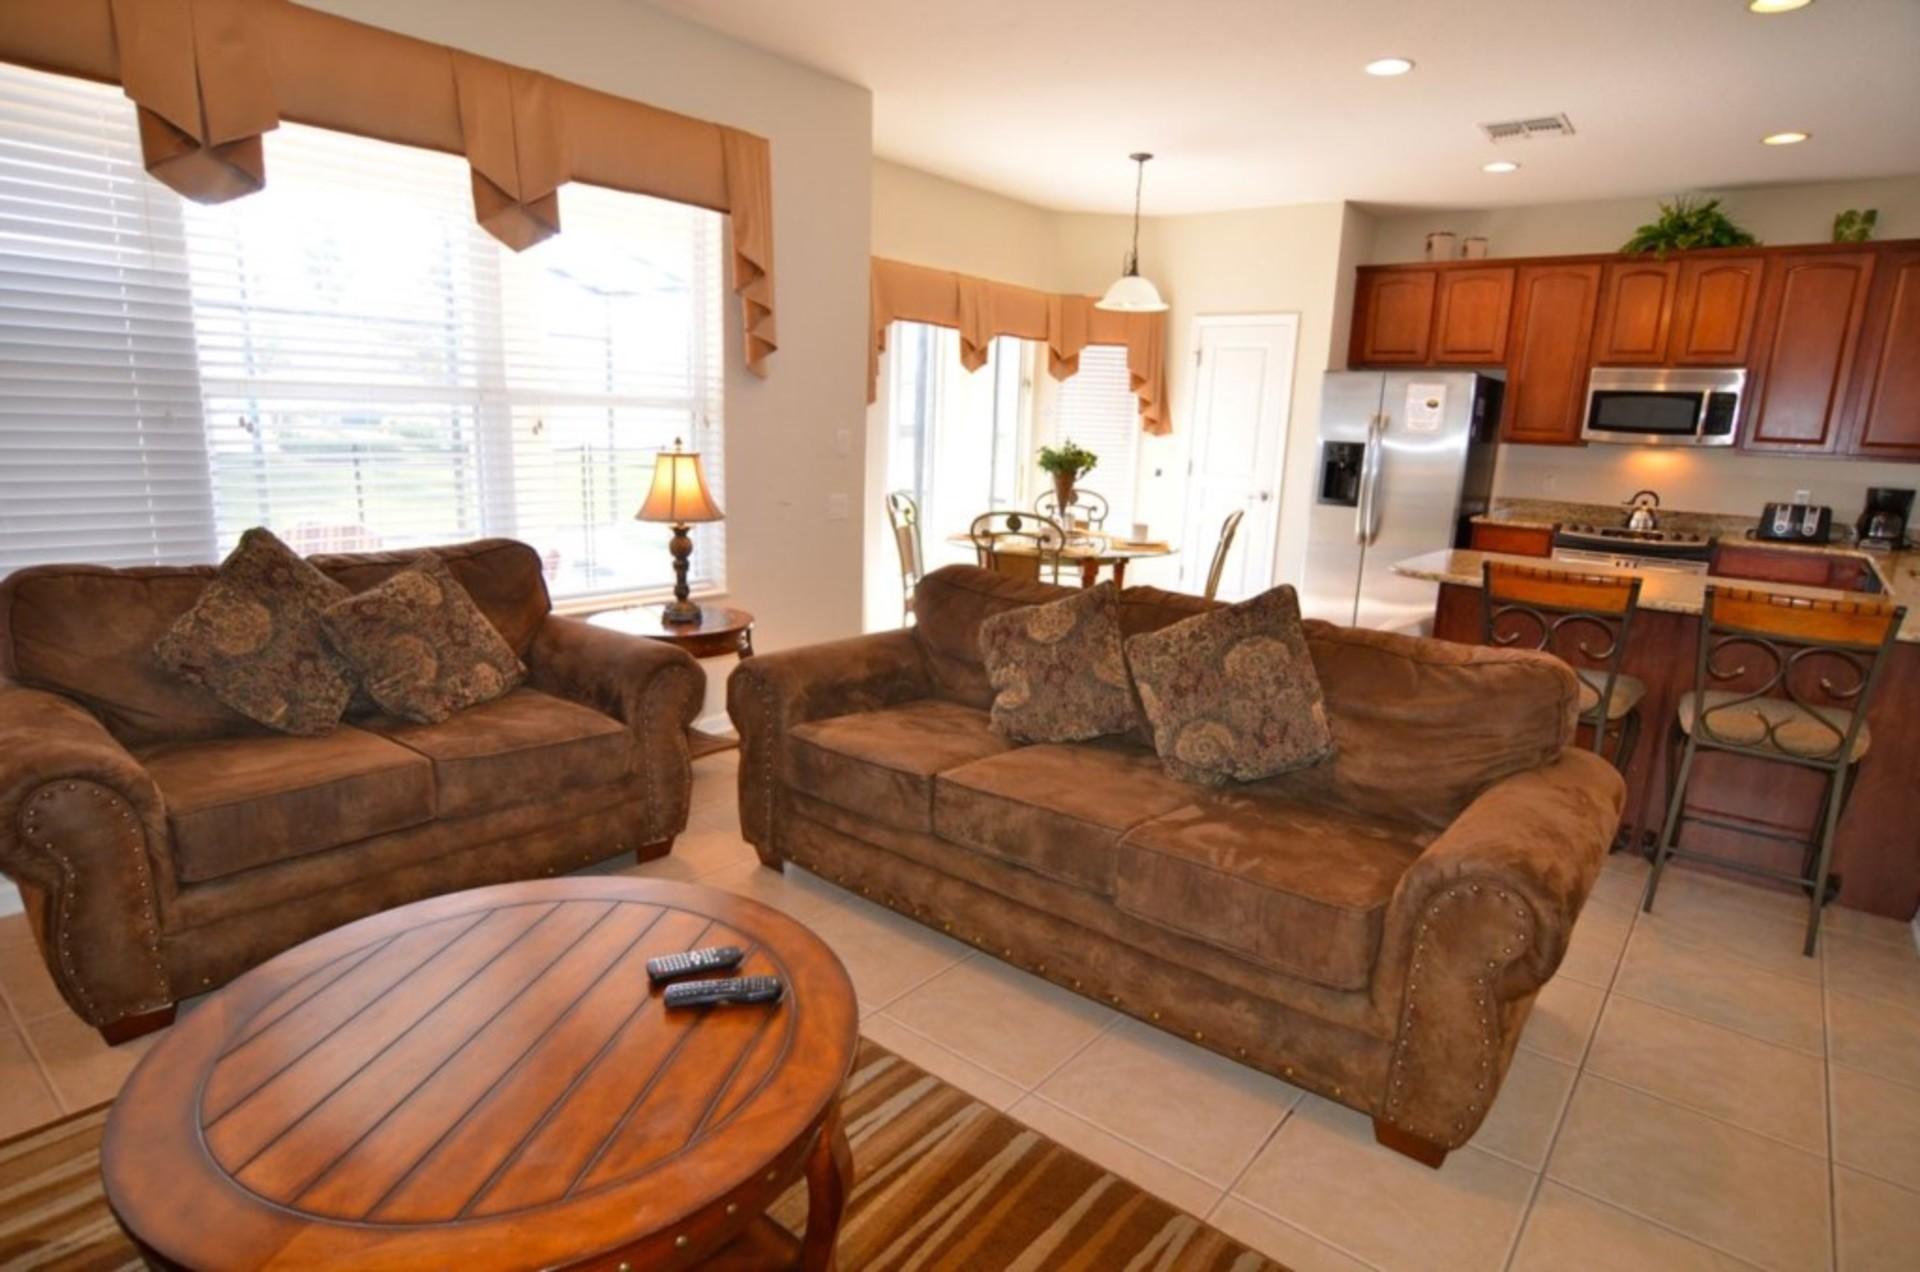 Enjoy a 5 Star Villa Holiday with your Family, Windsor Hills Resort, Villa Orlando 1459 photo 5803825